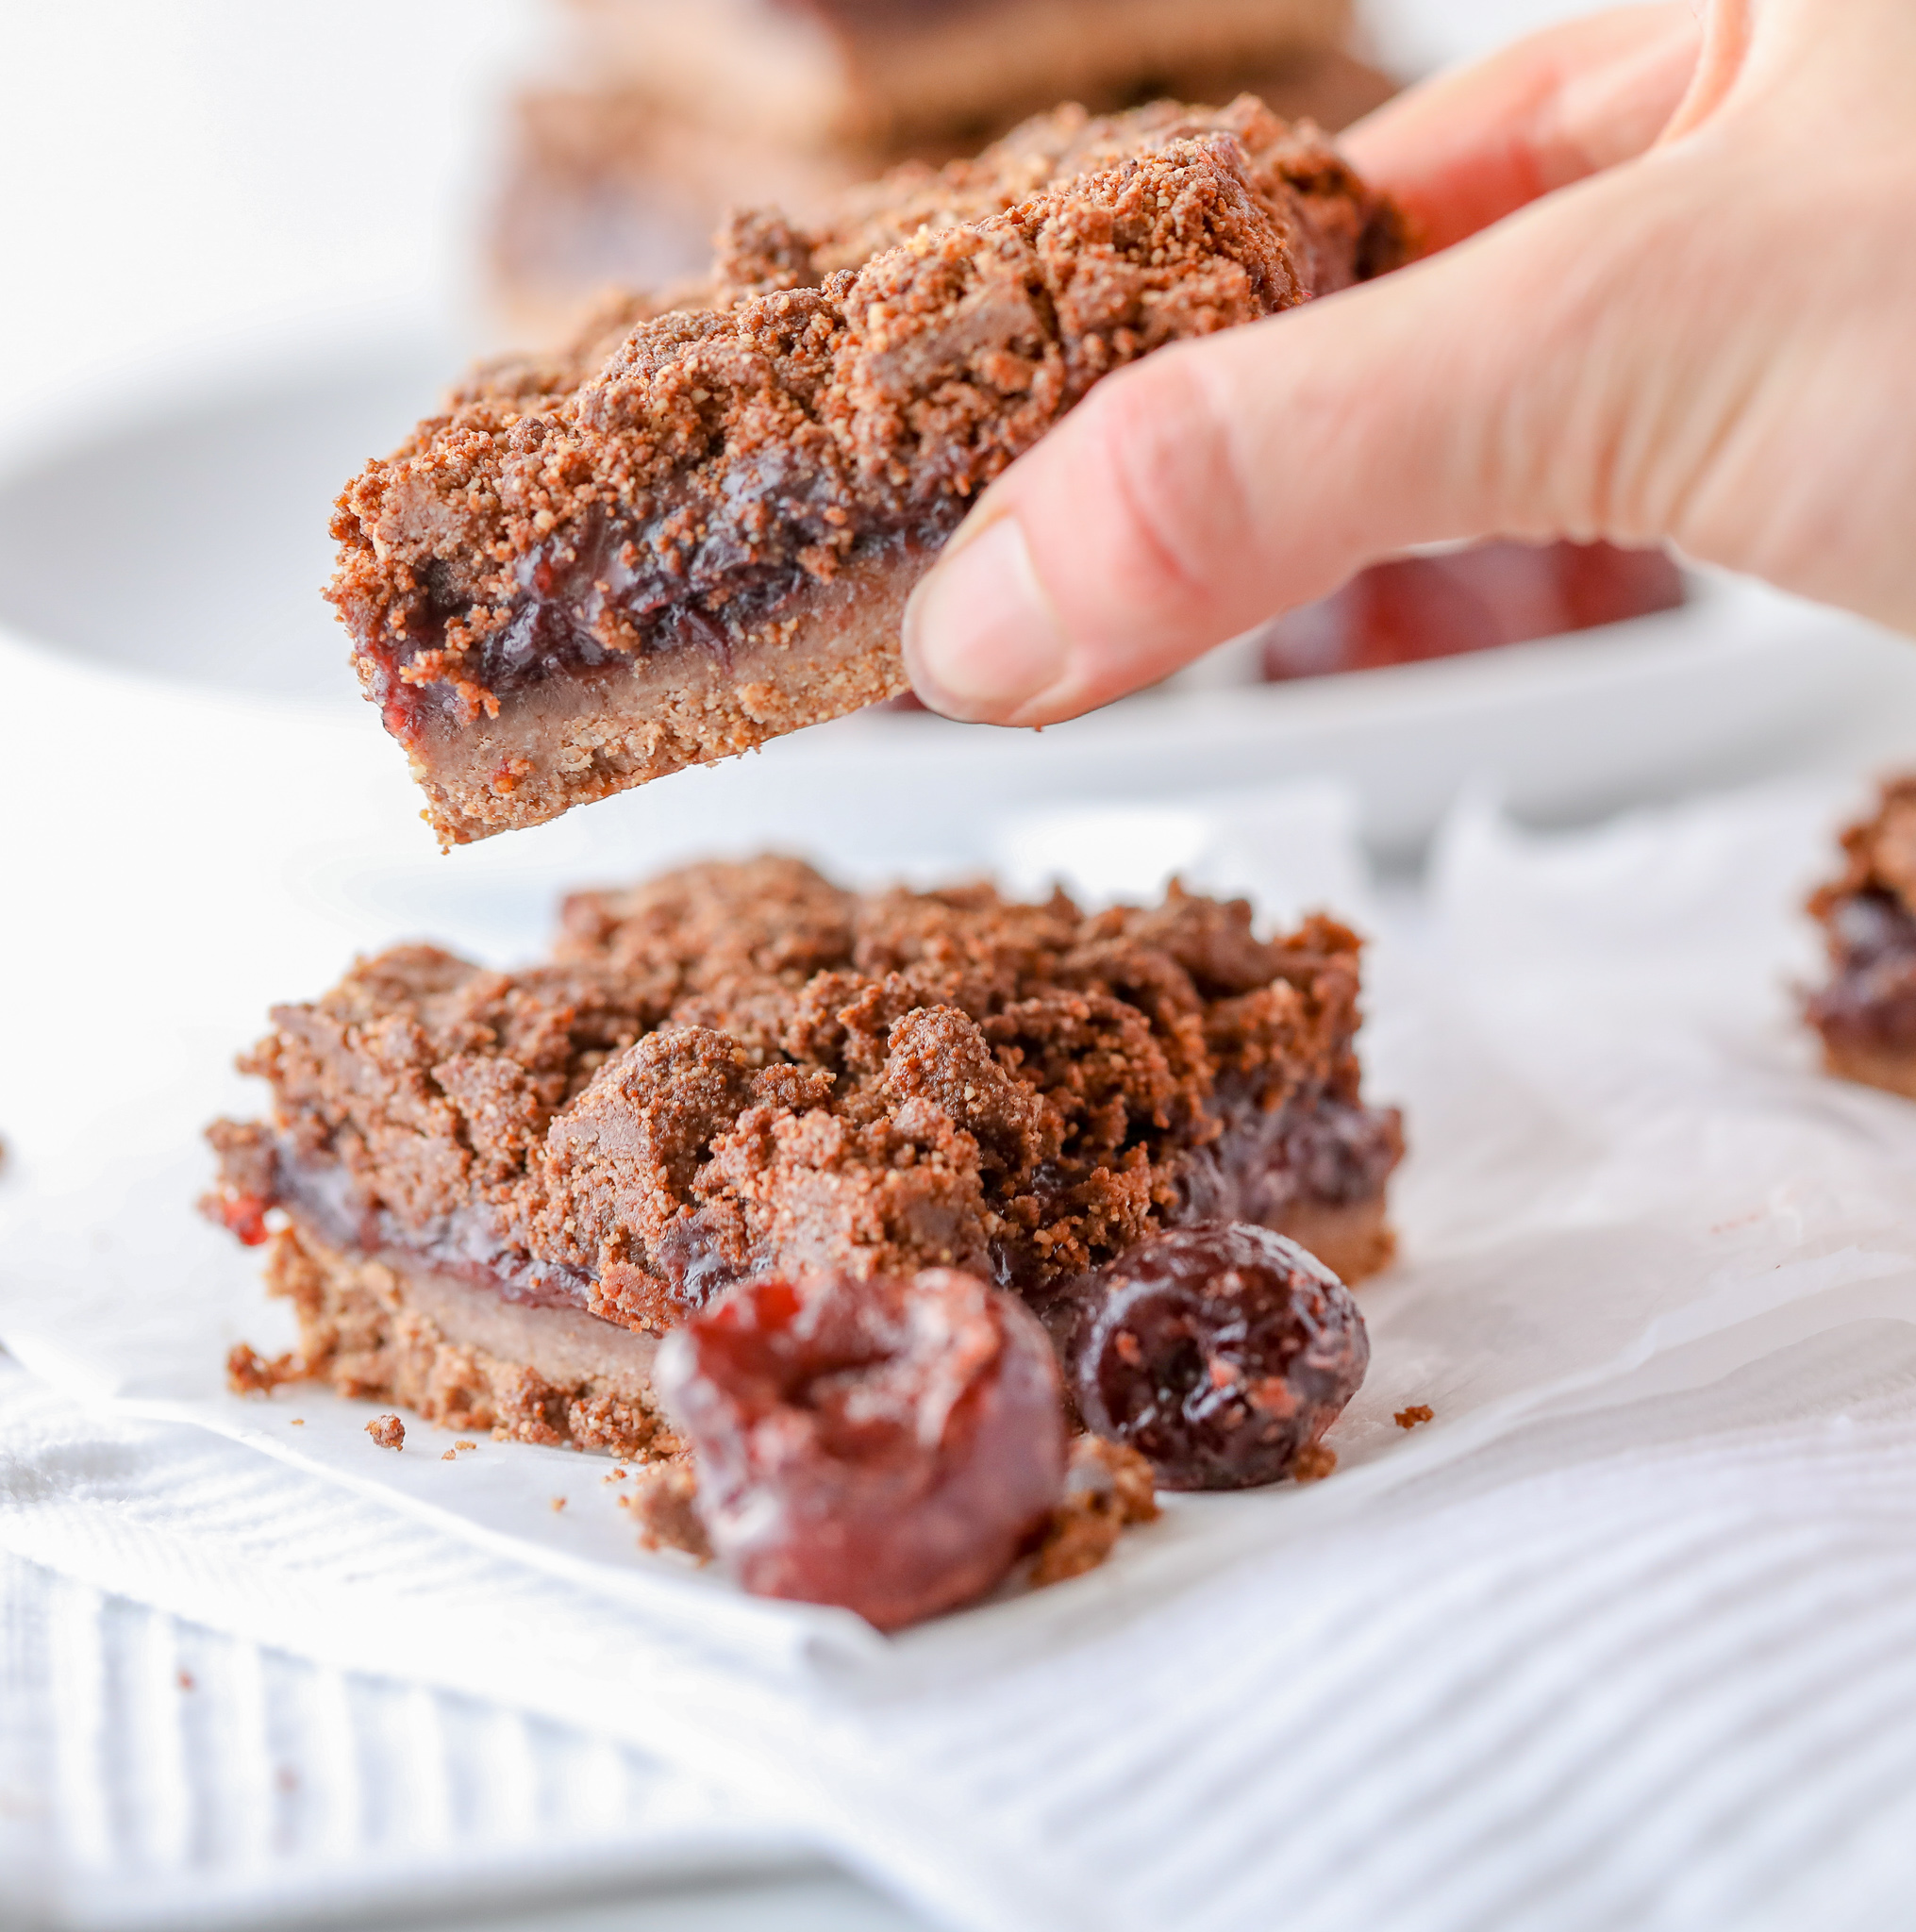 Healthy Cherry-Chocolate Crumble Bars (Grain-free, Dairy-free)